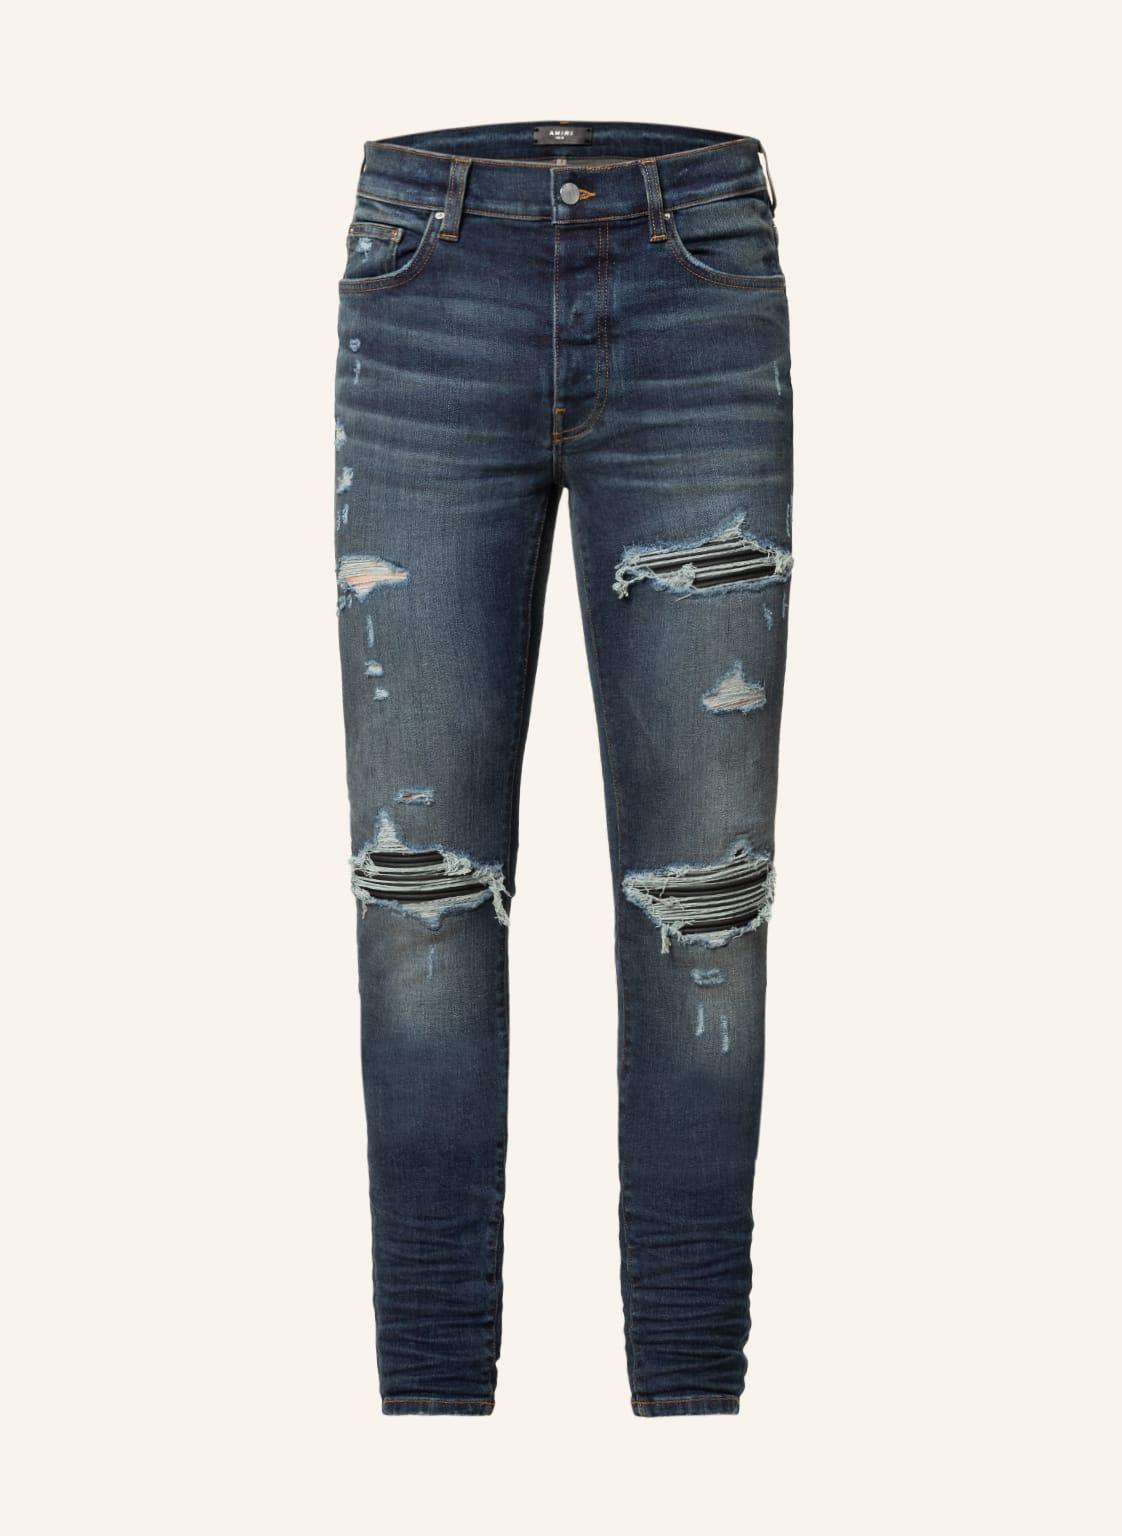 Image of Amiri Destroyed Jeans mx1 Skinny Fit blau